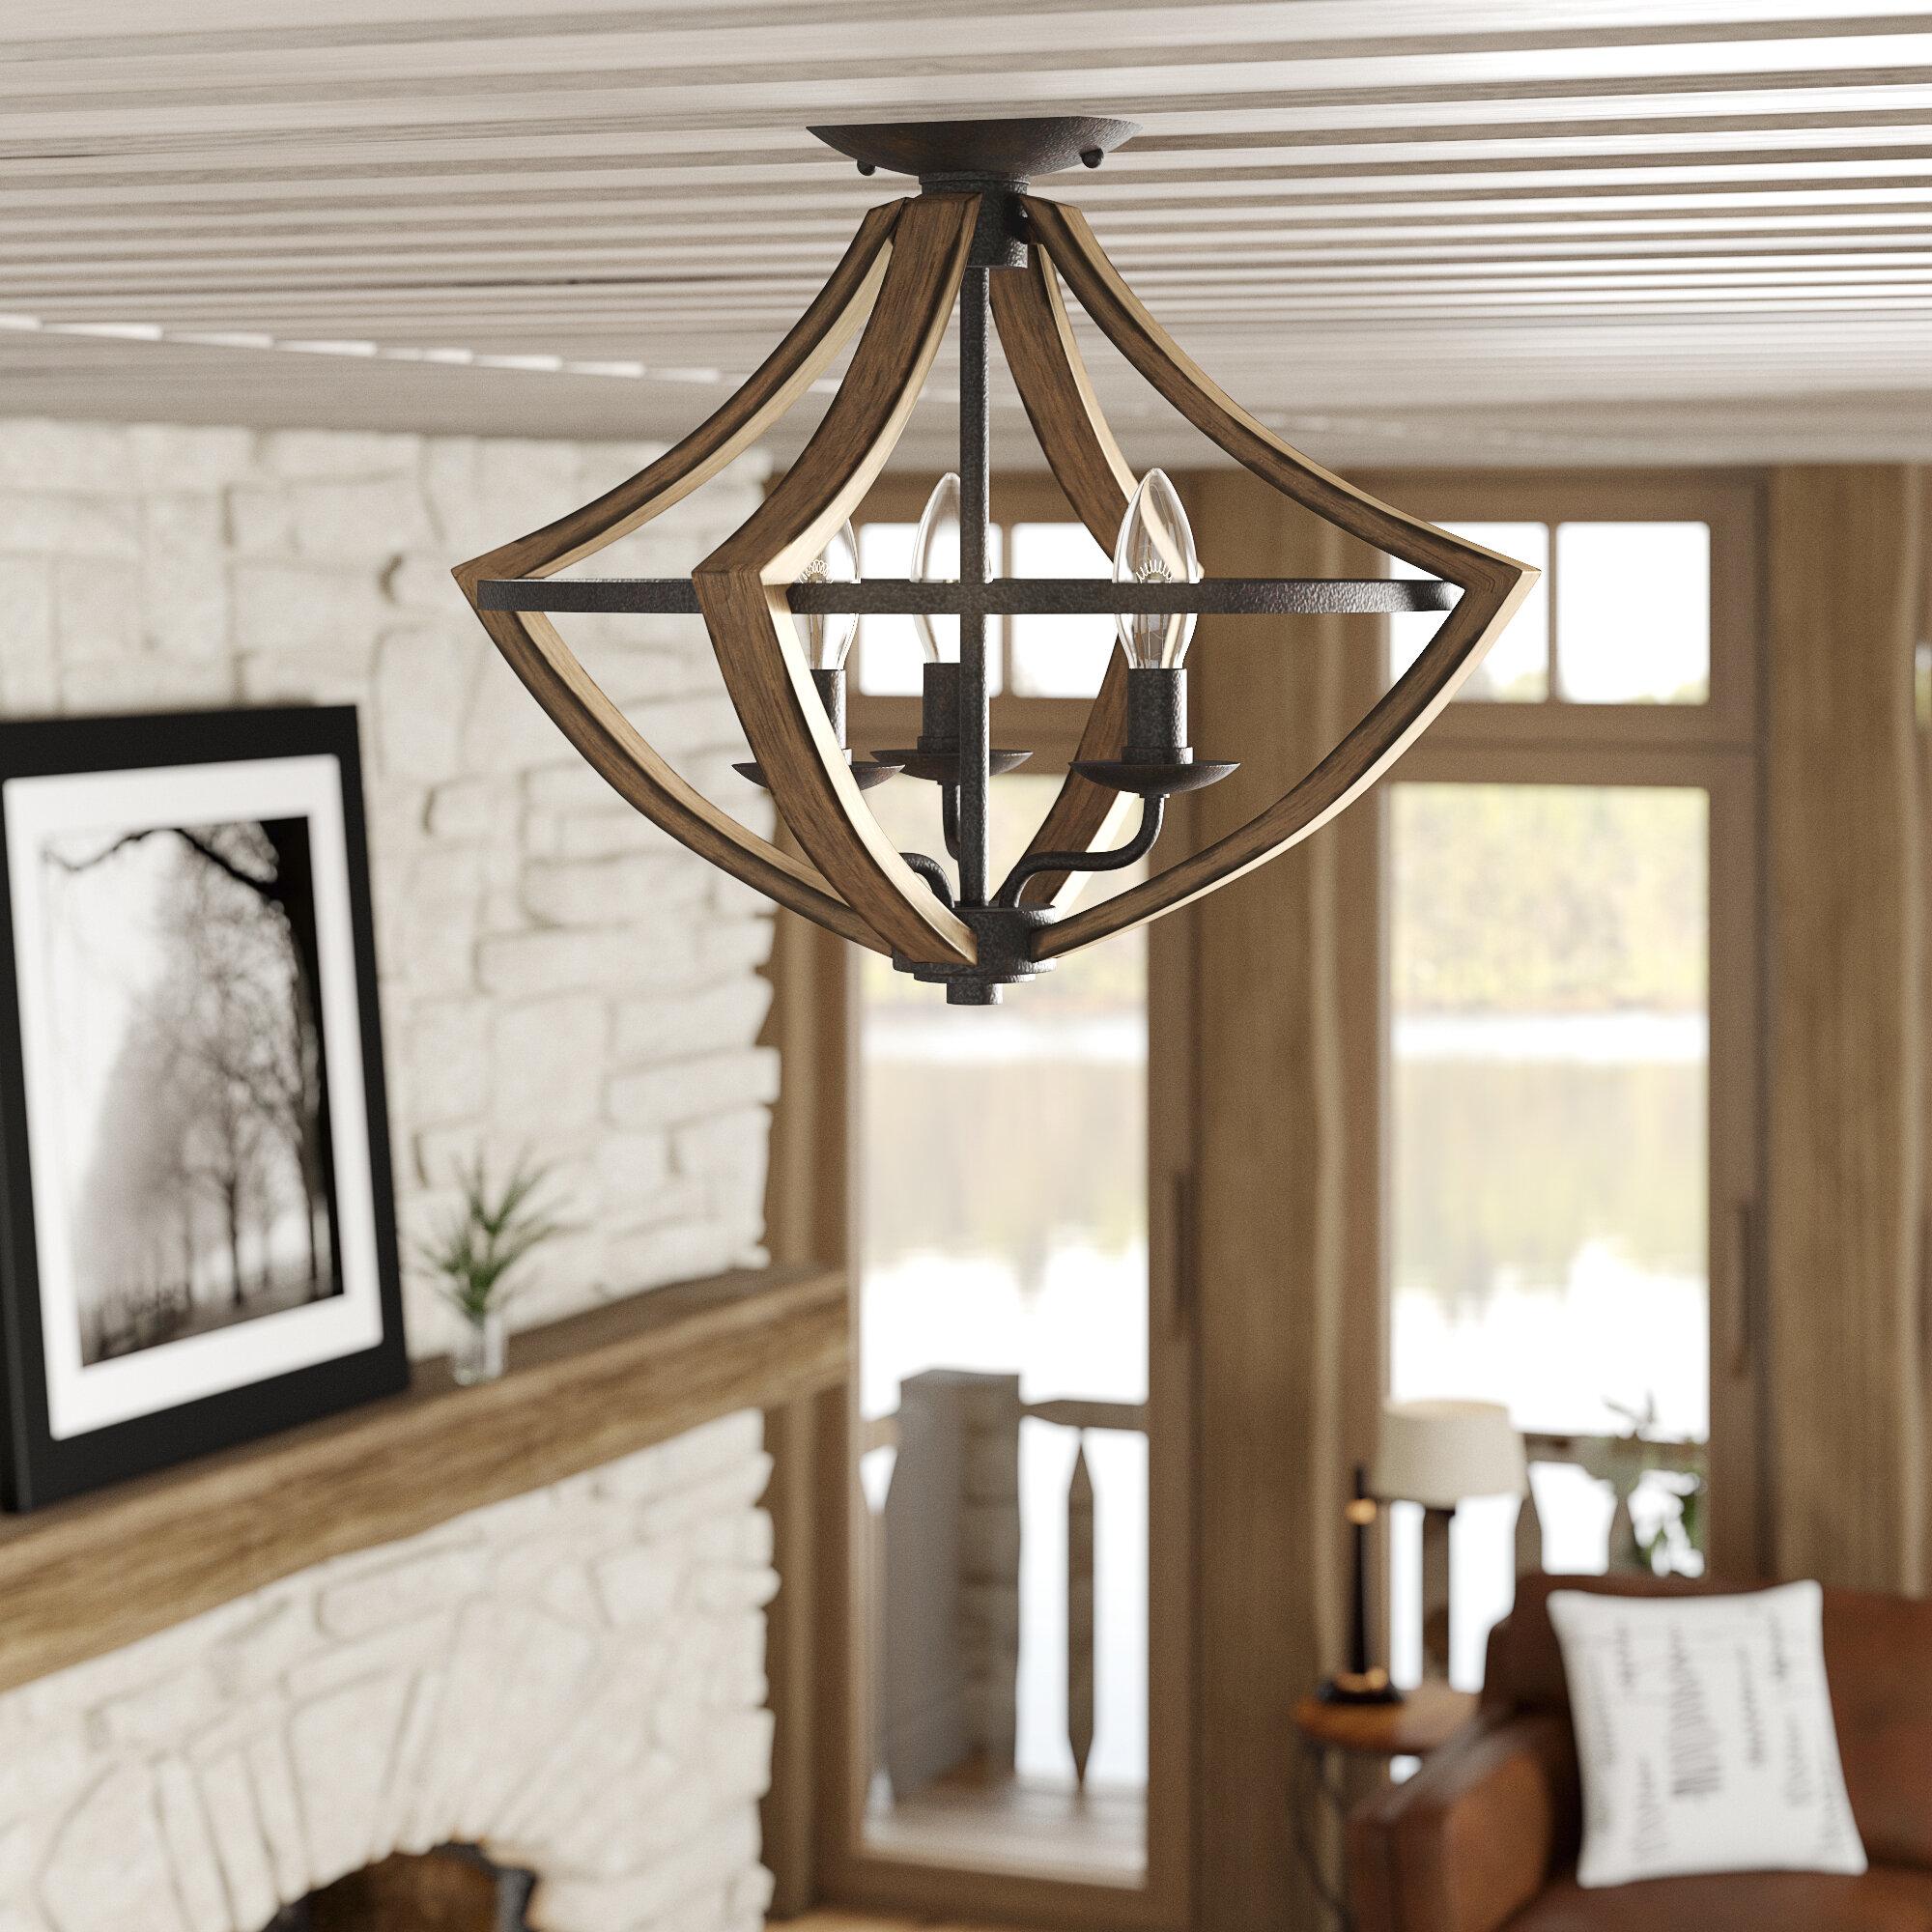 Flush mount lighting for low ceiling living room   Source: wayfair.com